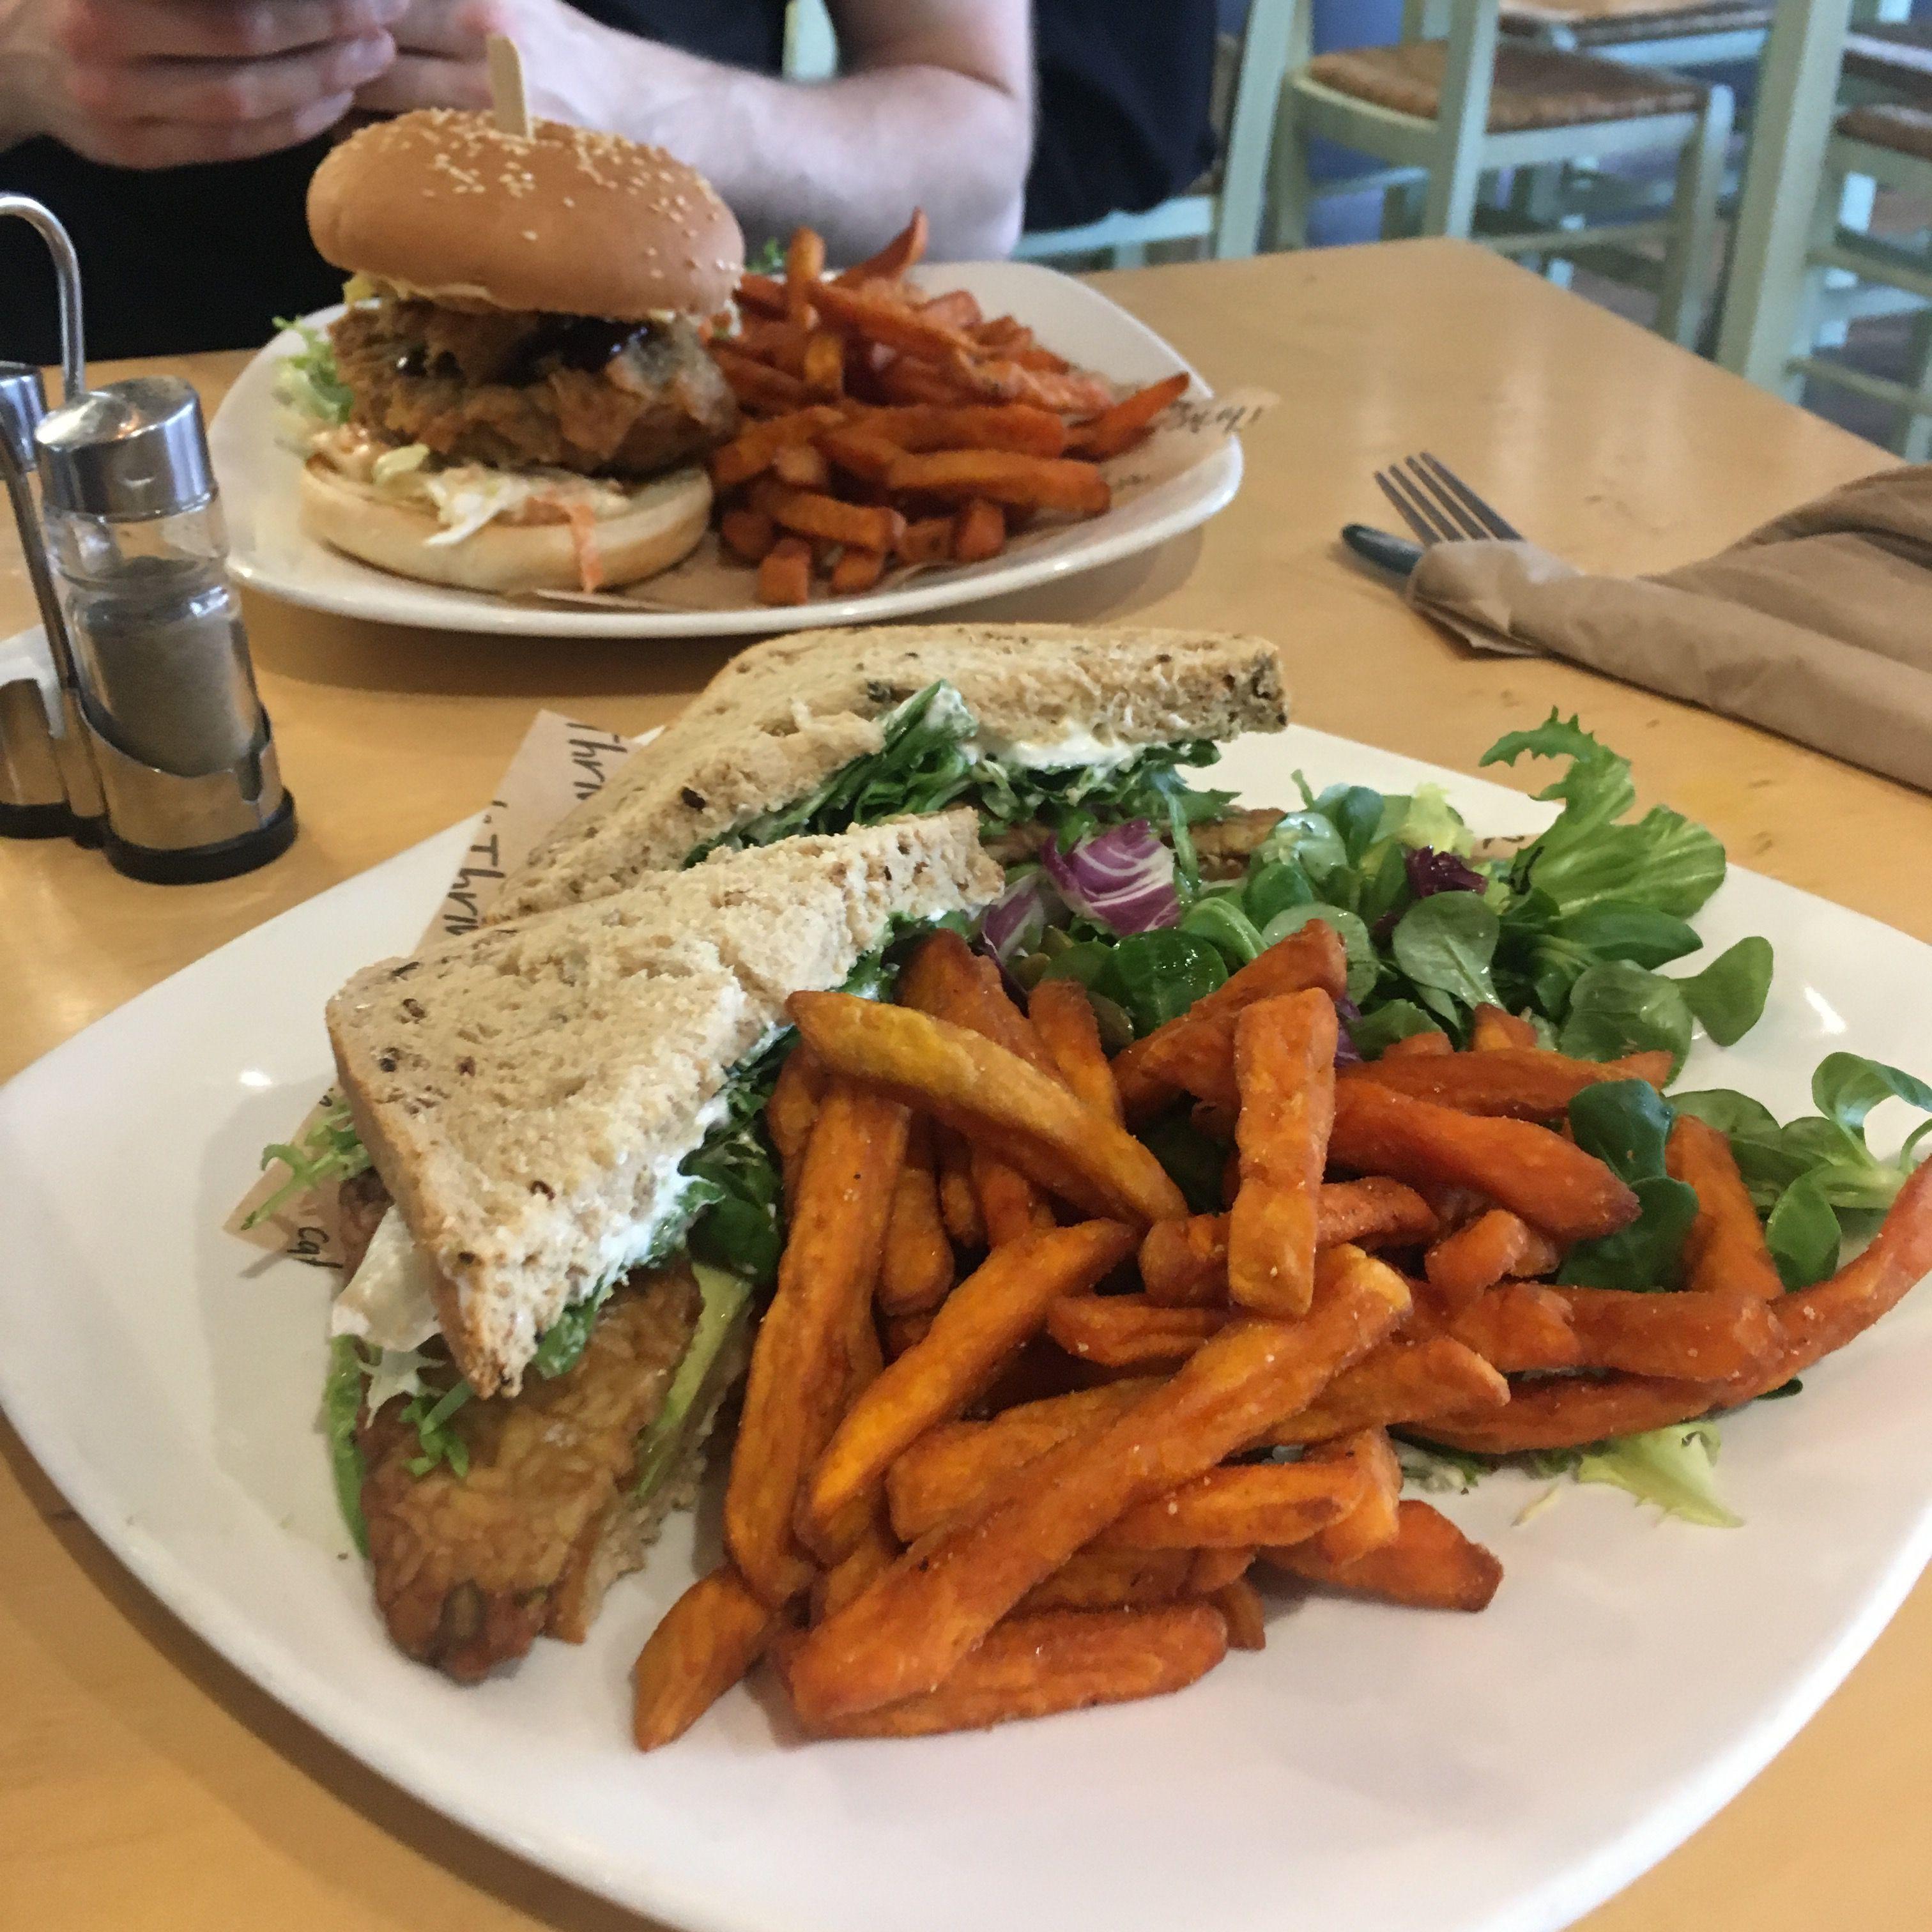 food at Cafe Thrive